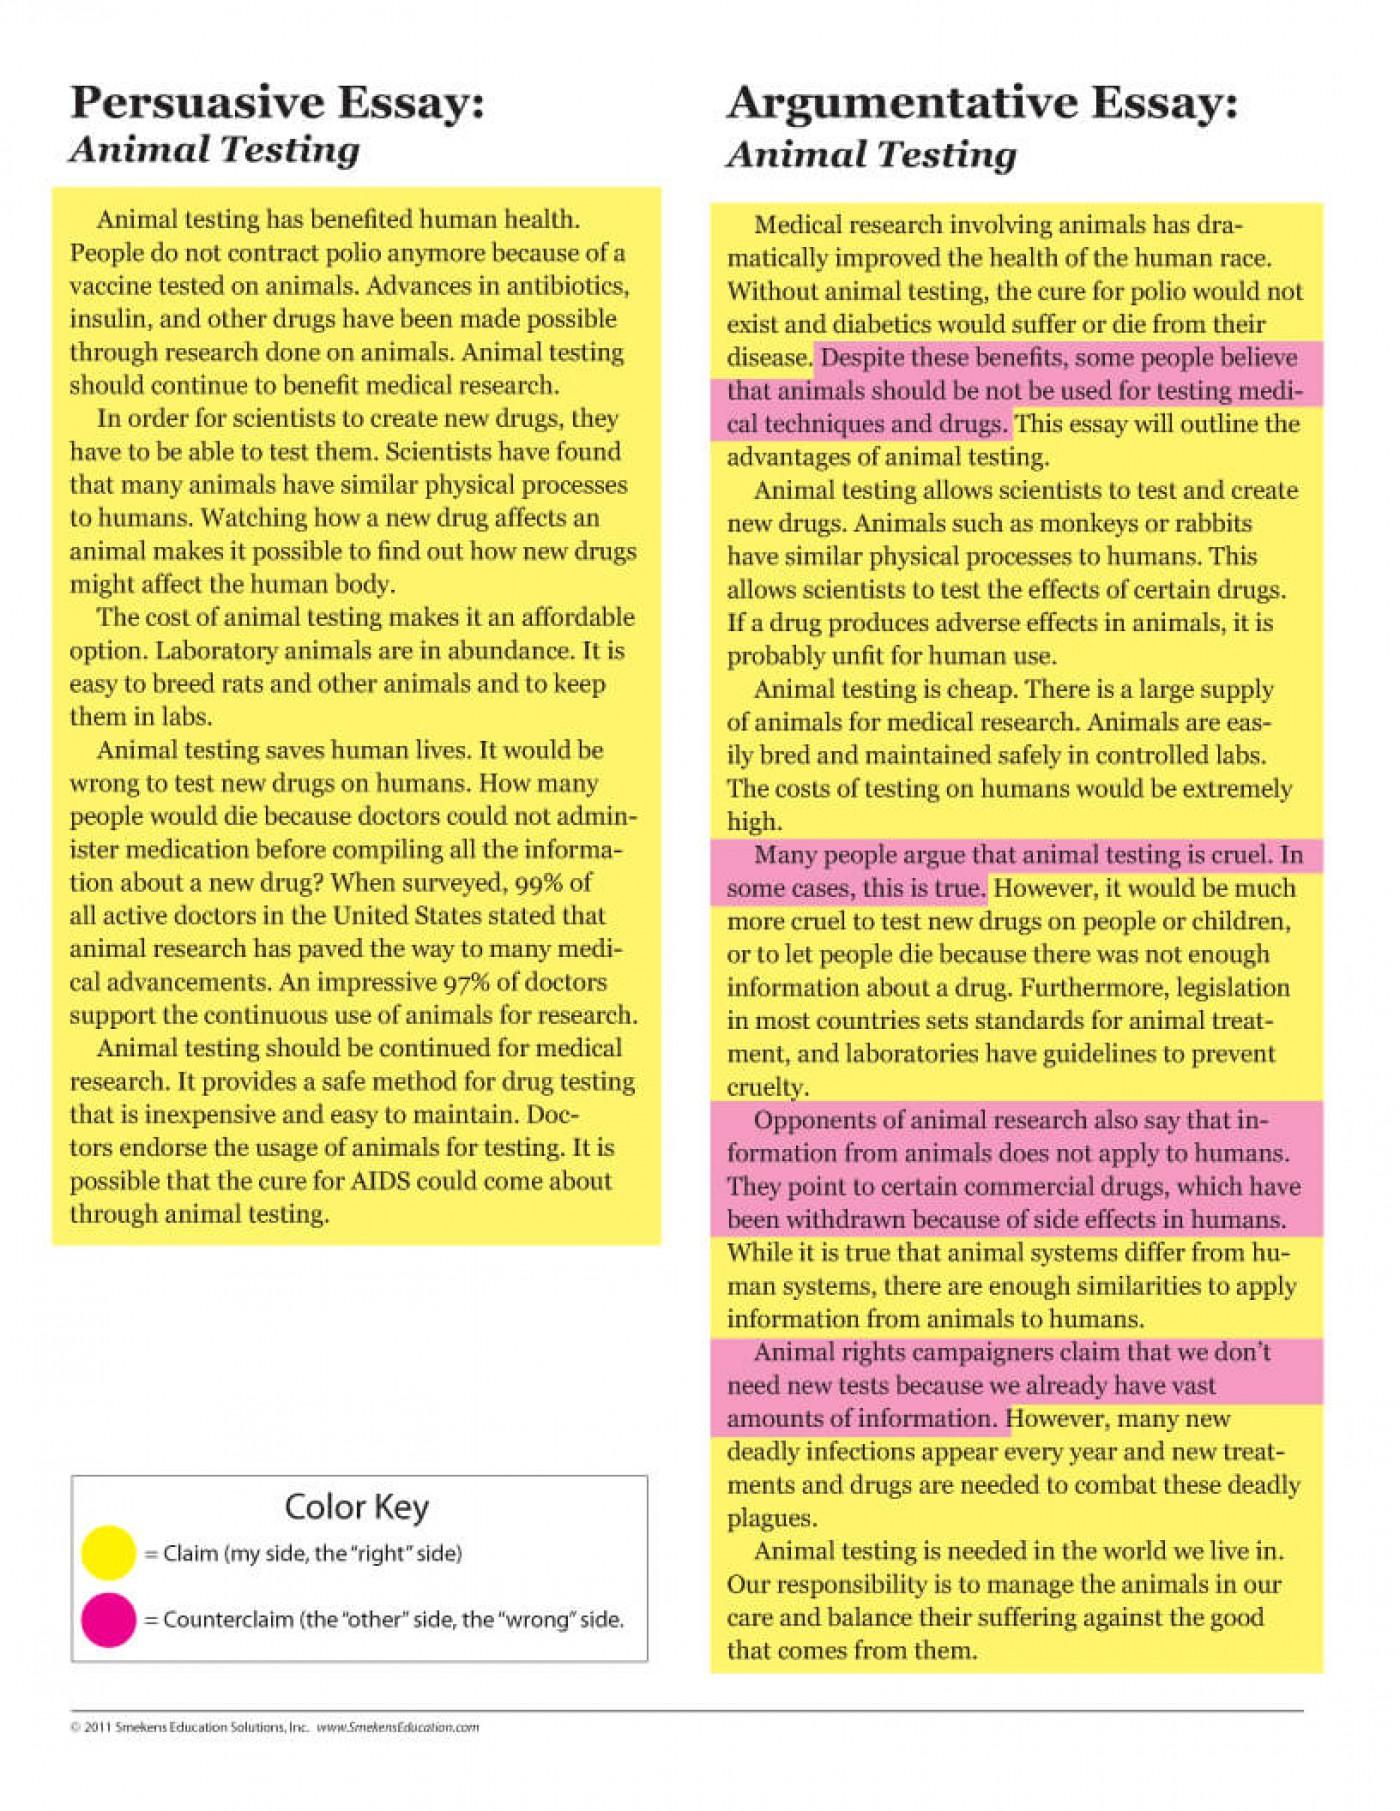 essay example short essays for high school students top rated    arg v pers animal testing color key o sample argumentative essay  middle school shocking outline